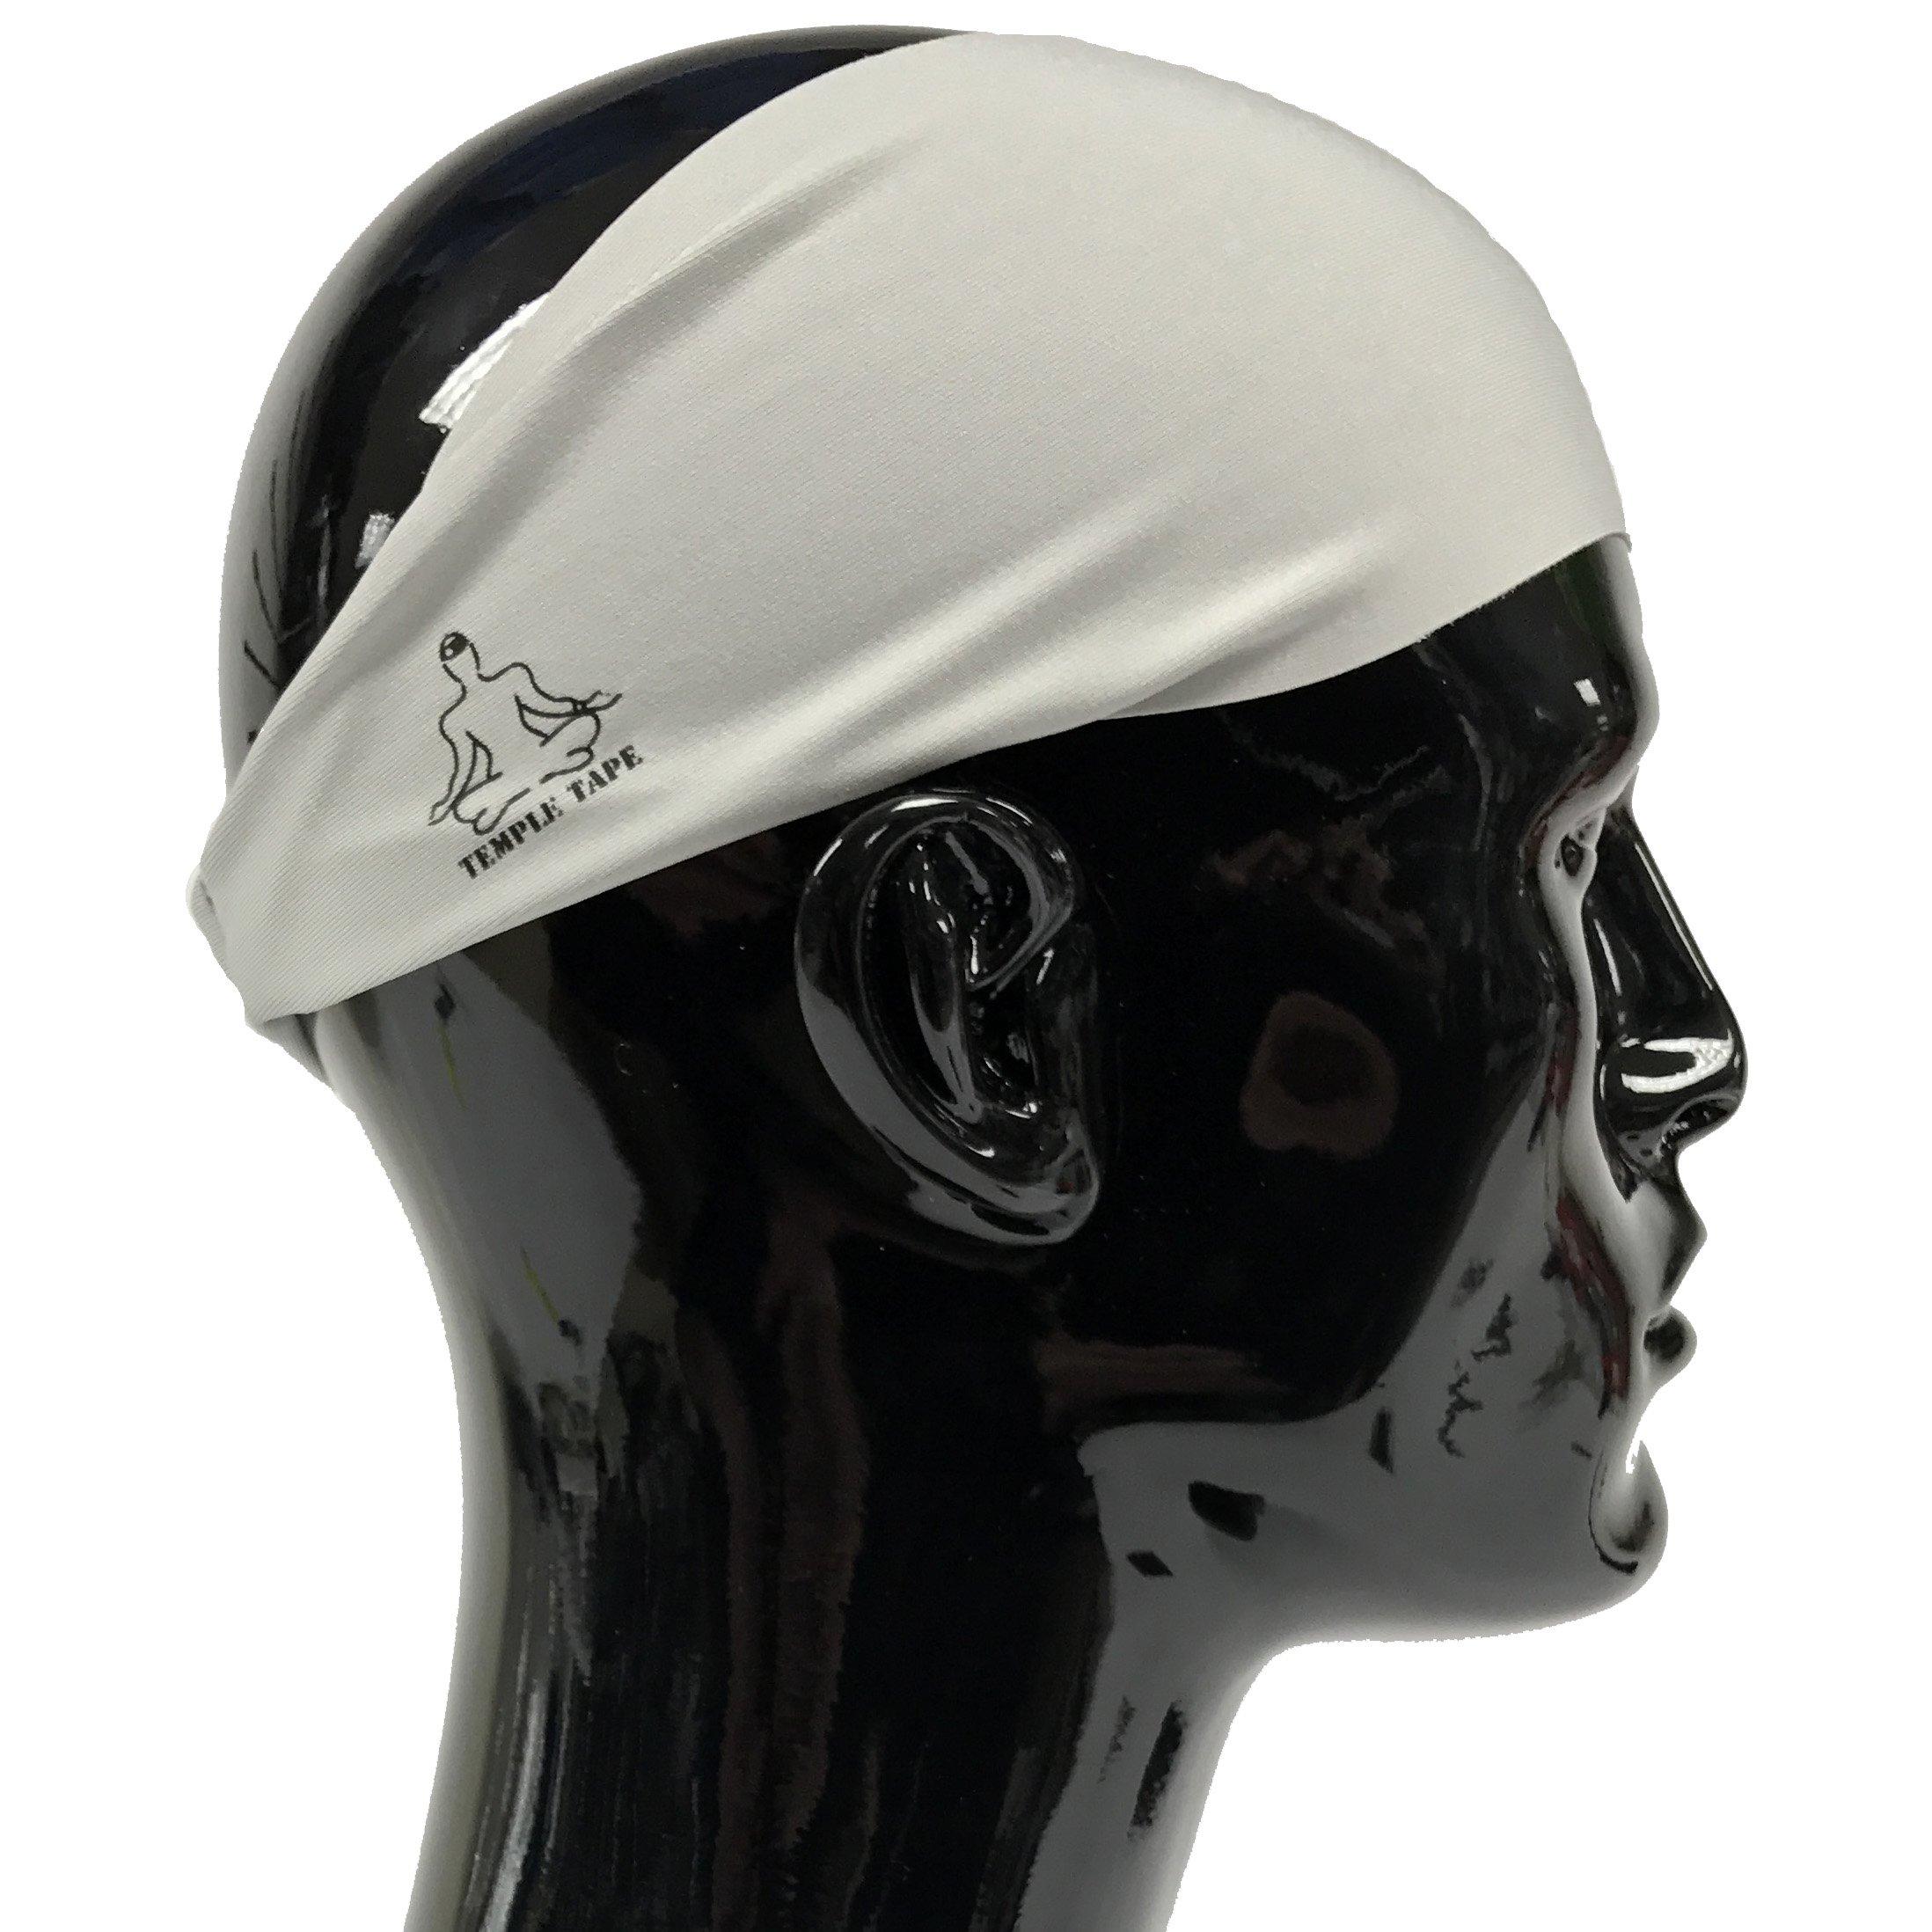 Temple Tape Headbands for Men and Women - Mens Sweatband & Sports Headband Moisture Wicking Workout Sweatbands for Running, Cross Training, Yoga and Bike Helmet Friendly - Gray